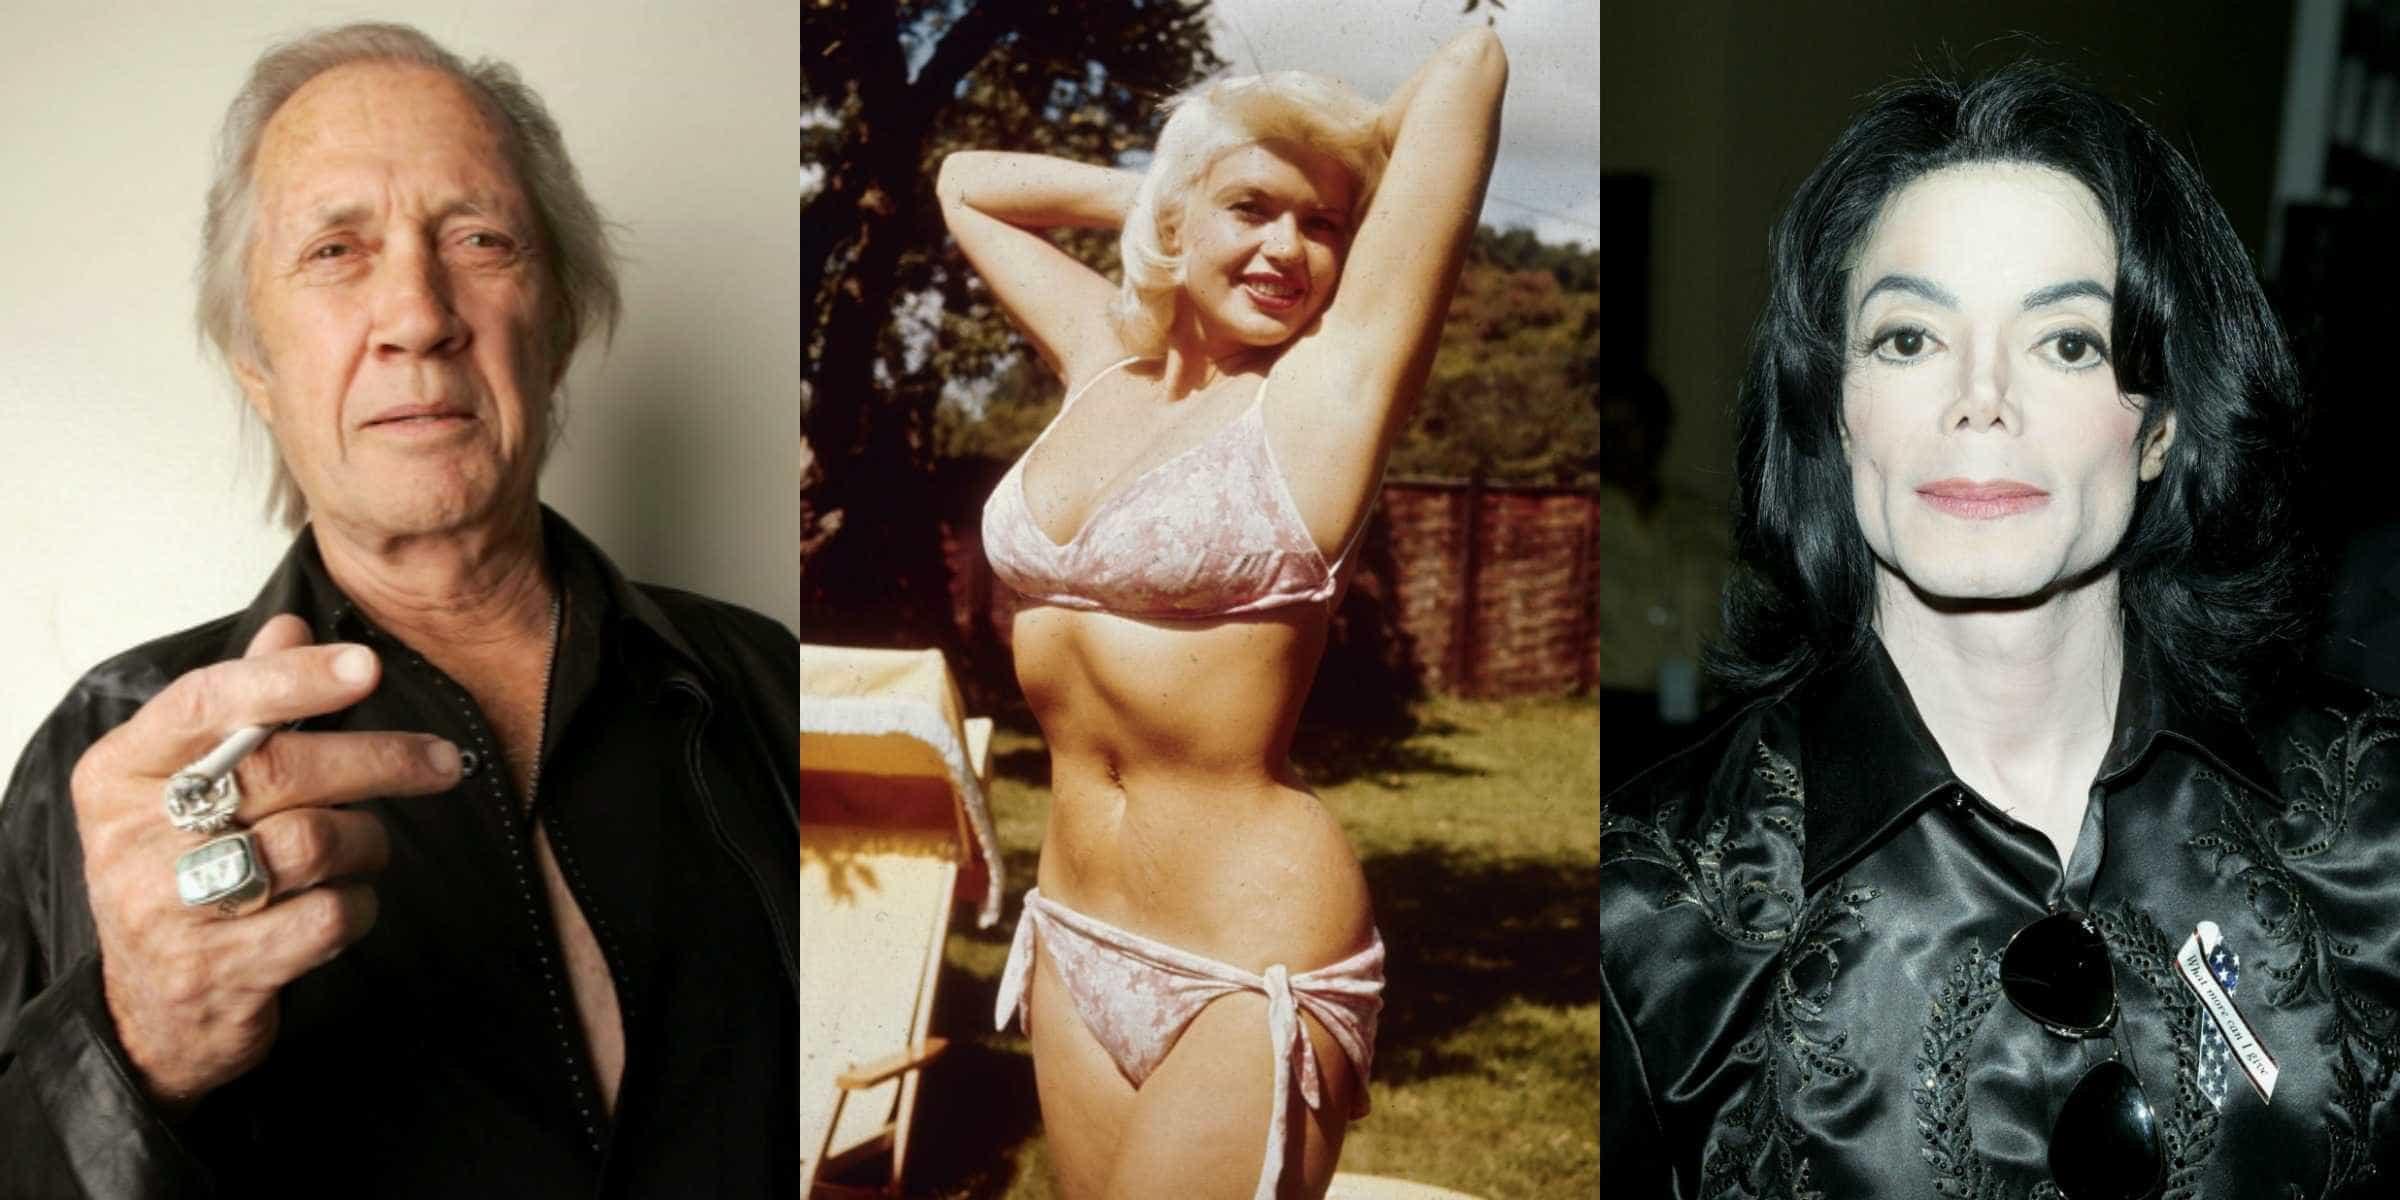 As misteriosas mortes das celebridades